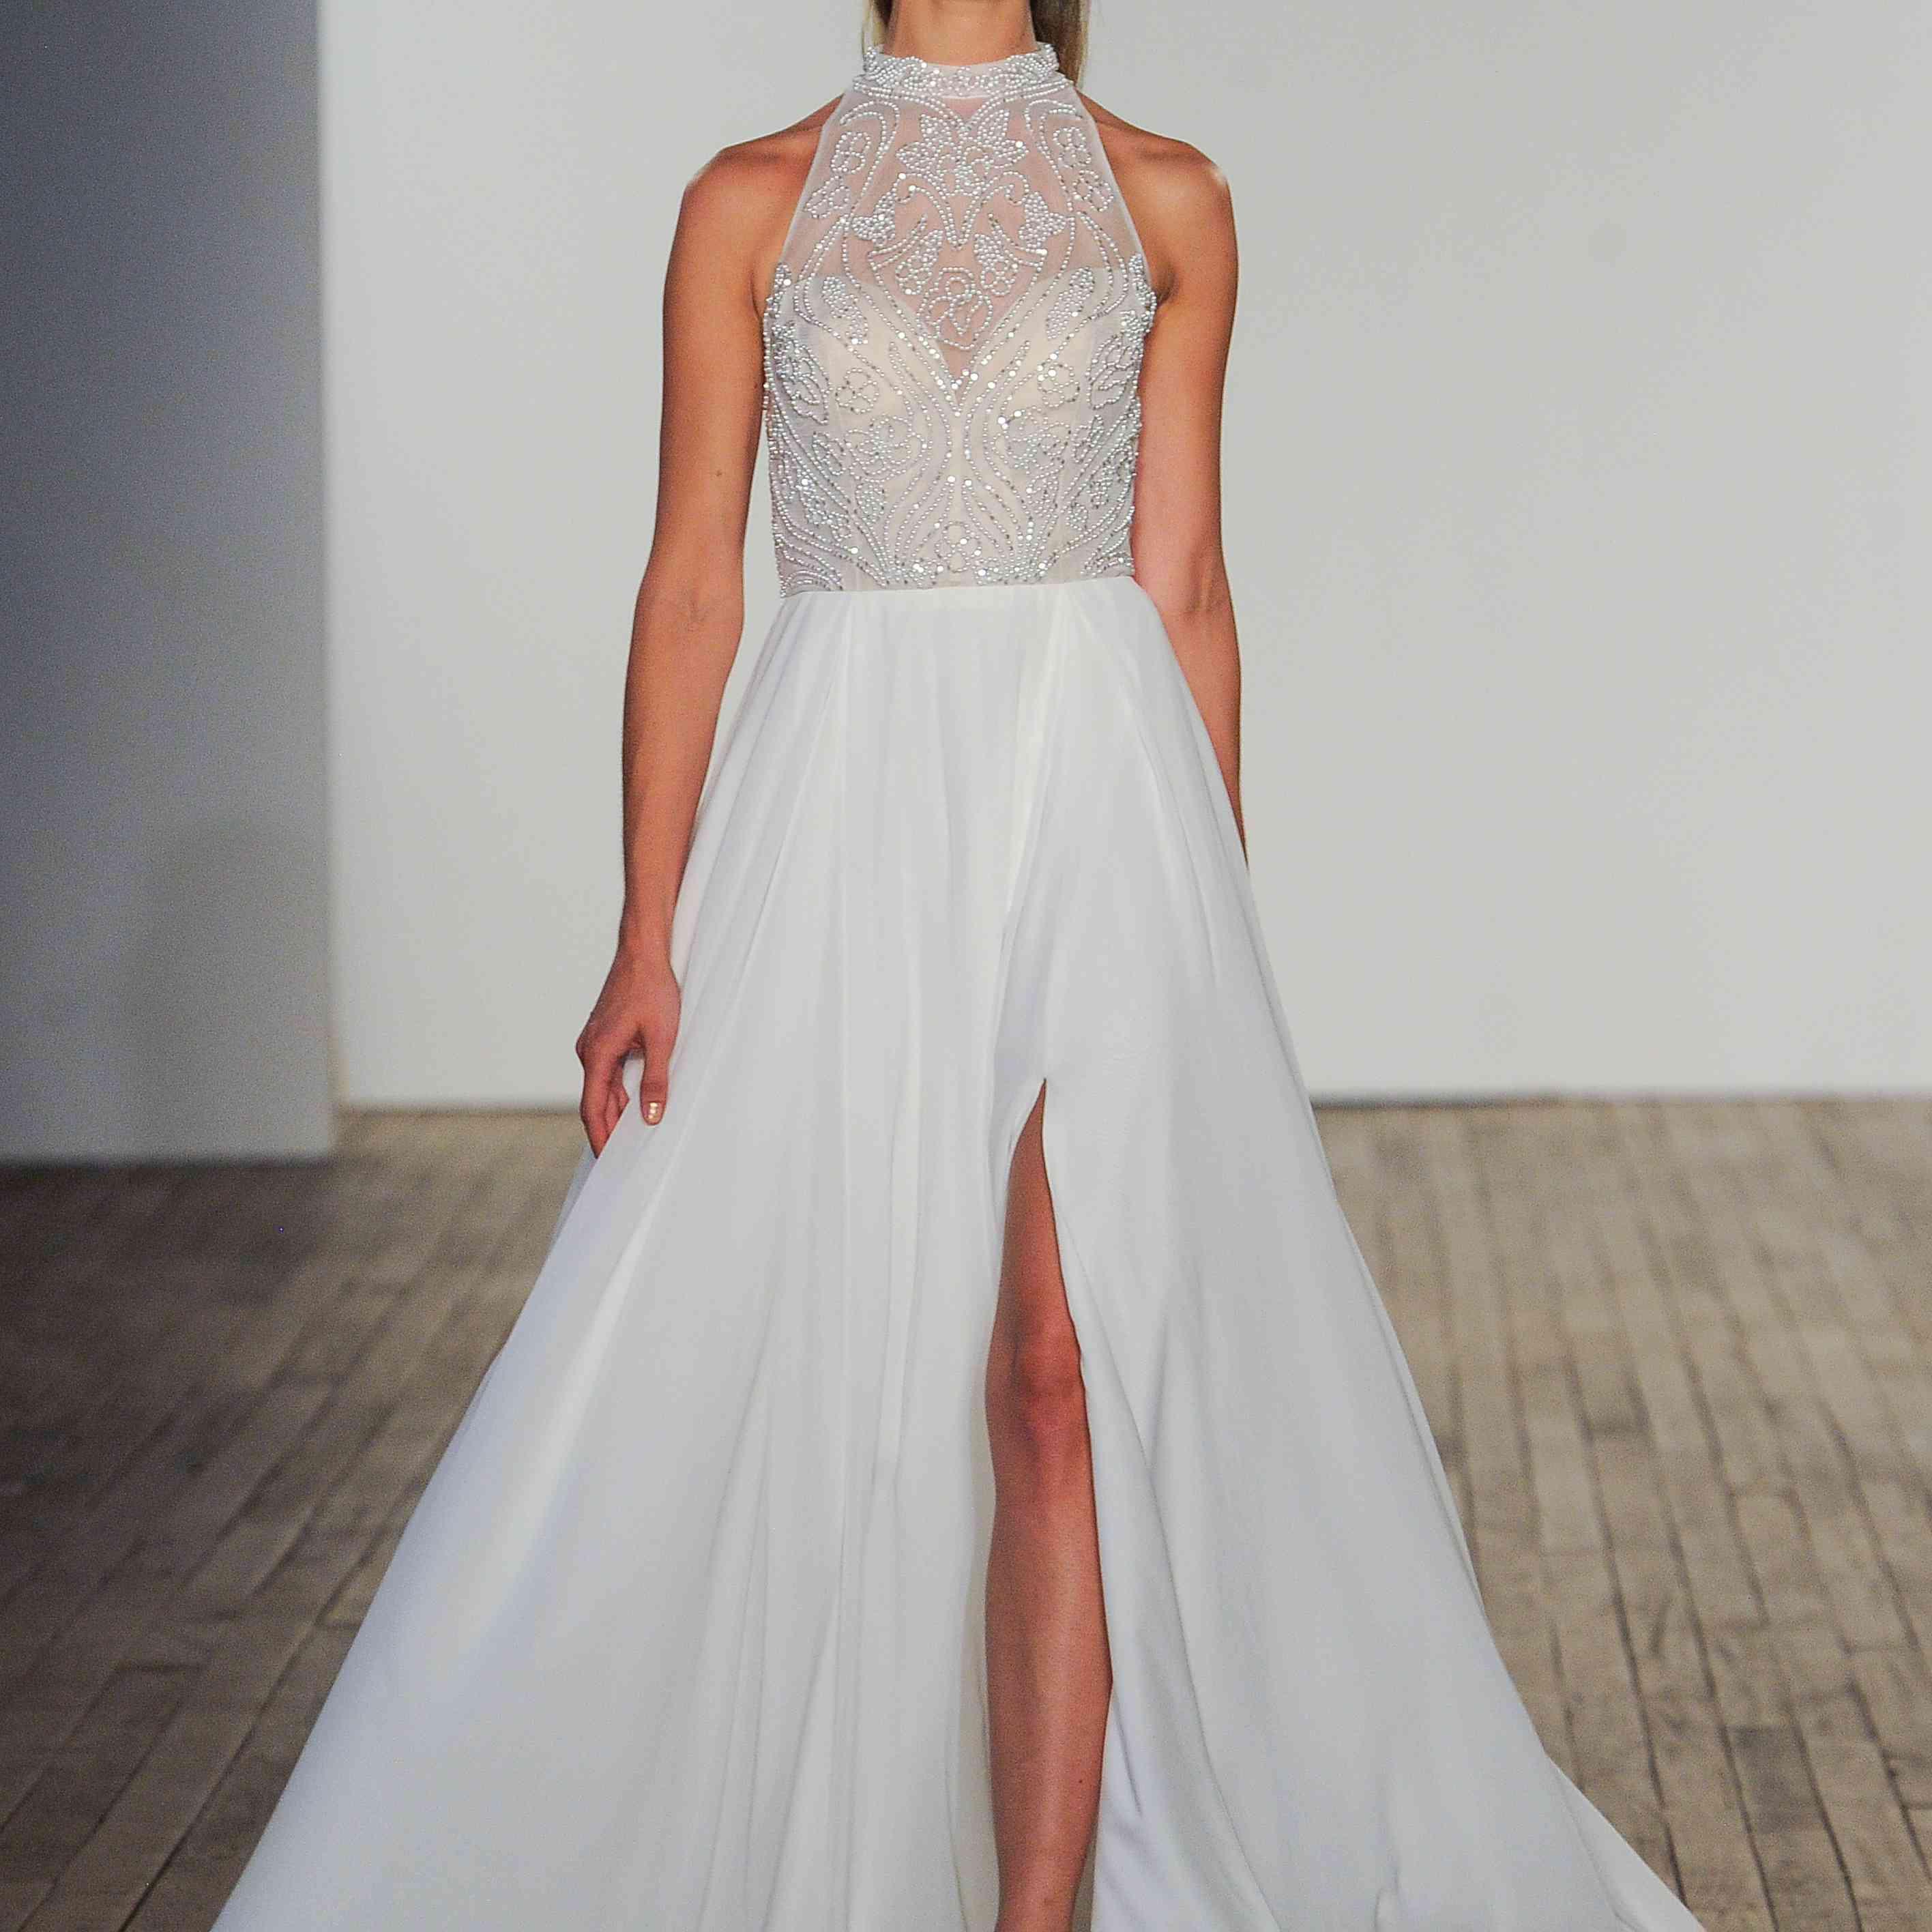 Artem Blush by Hayley Paige Wedding Dress